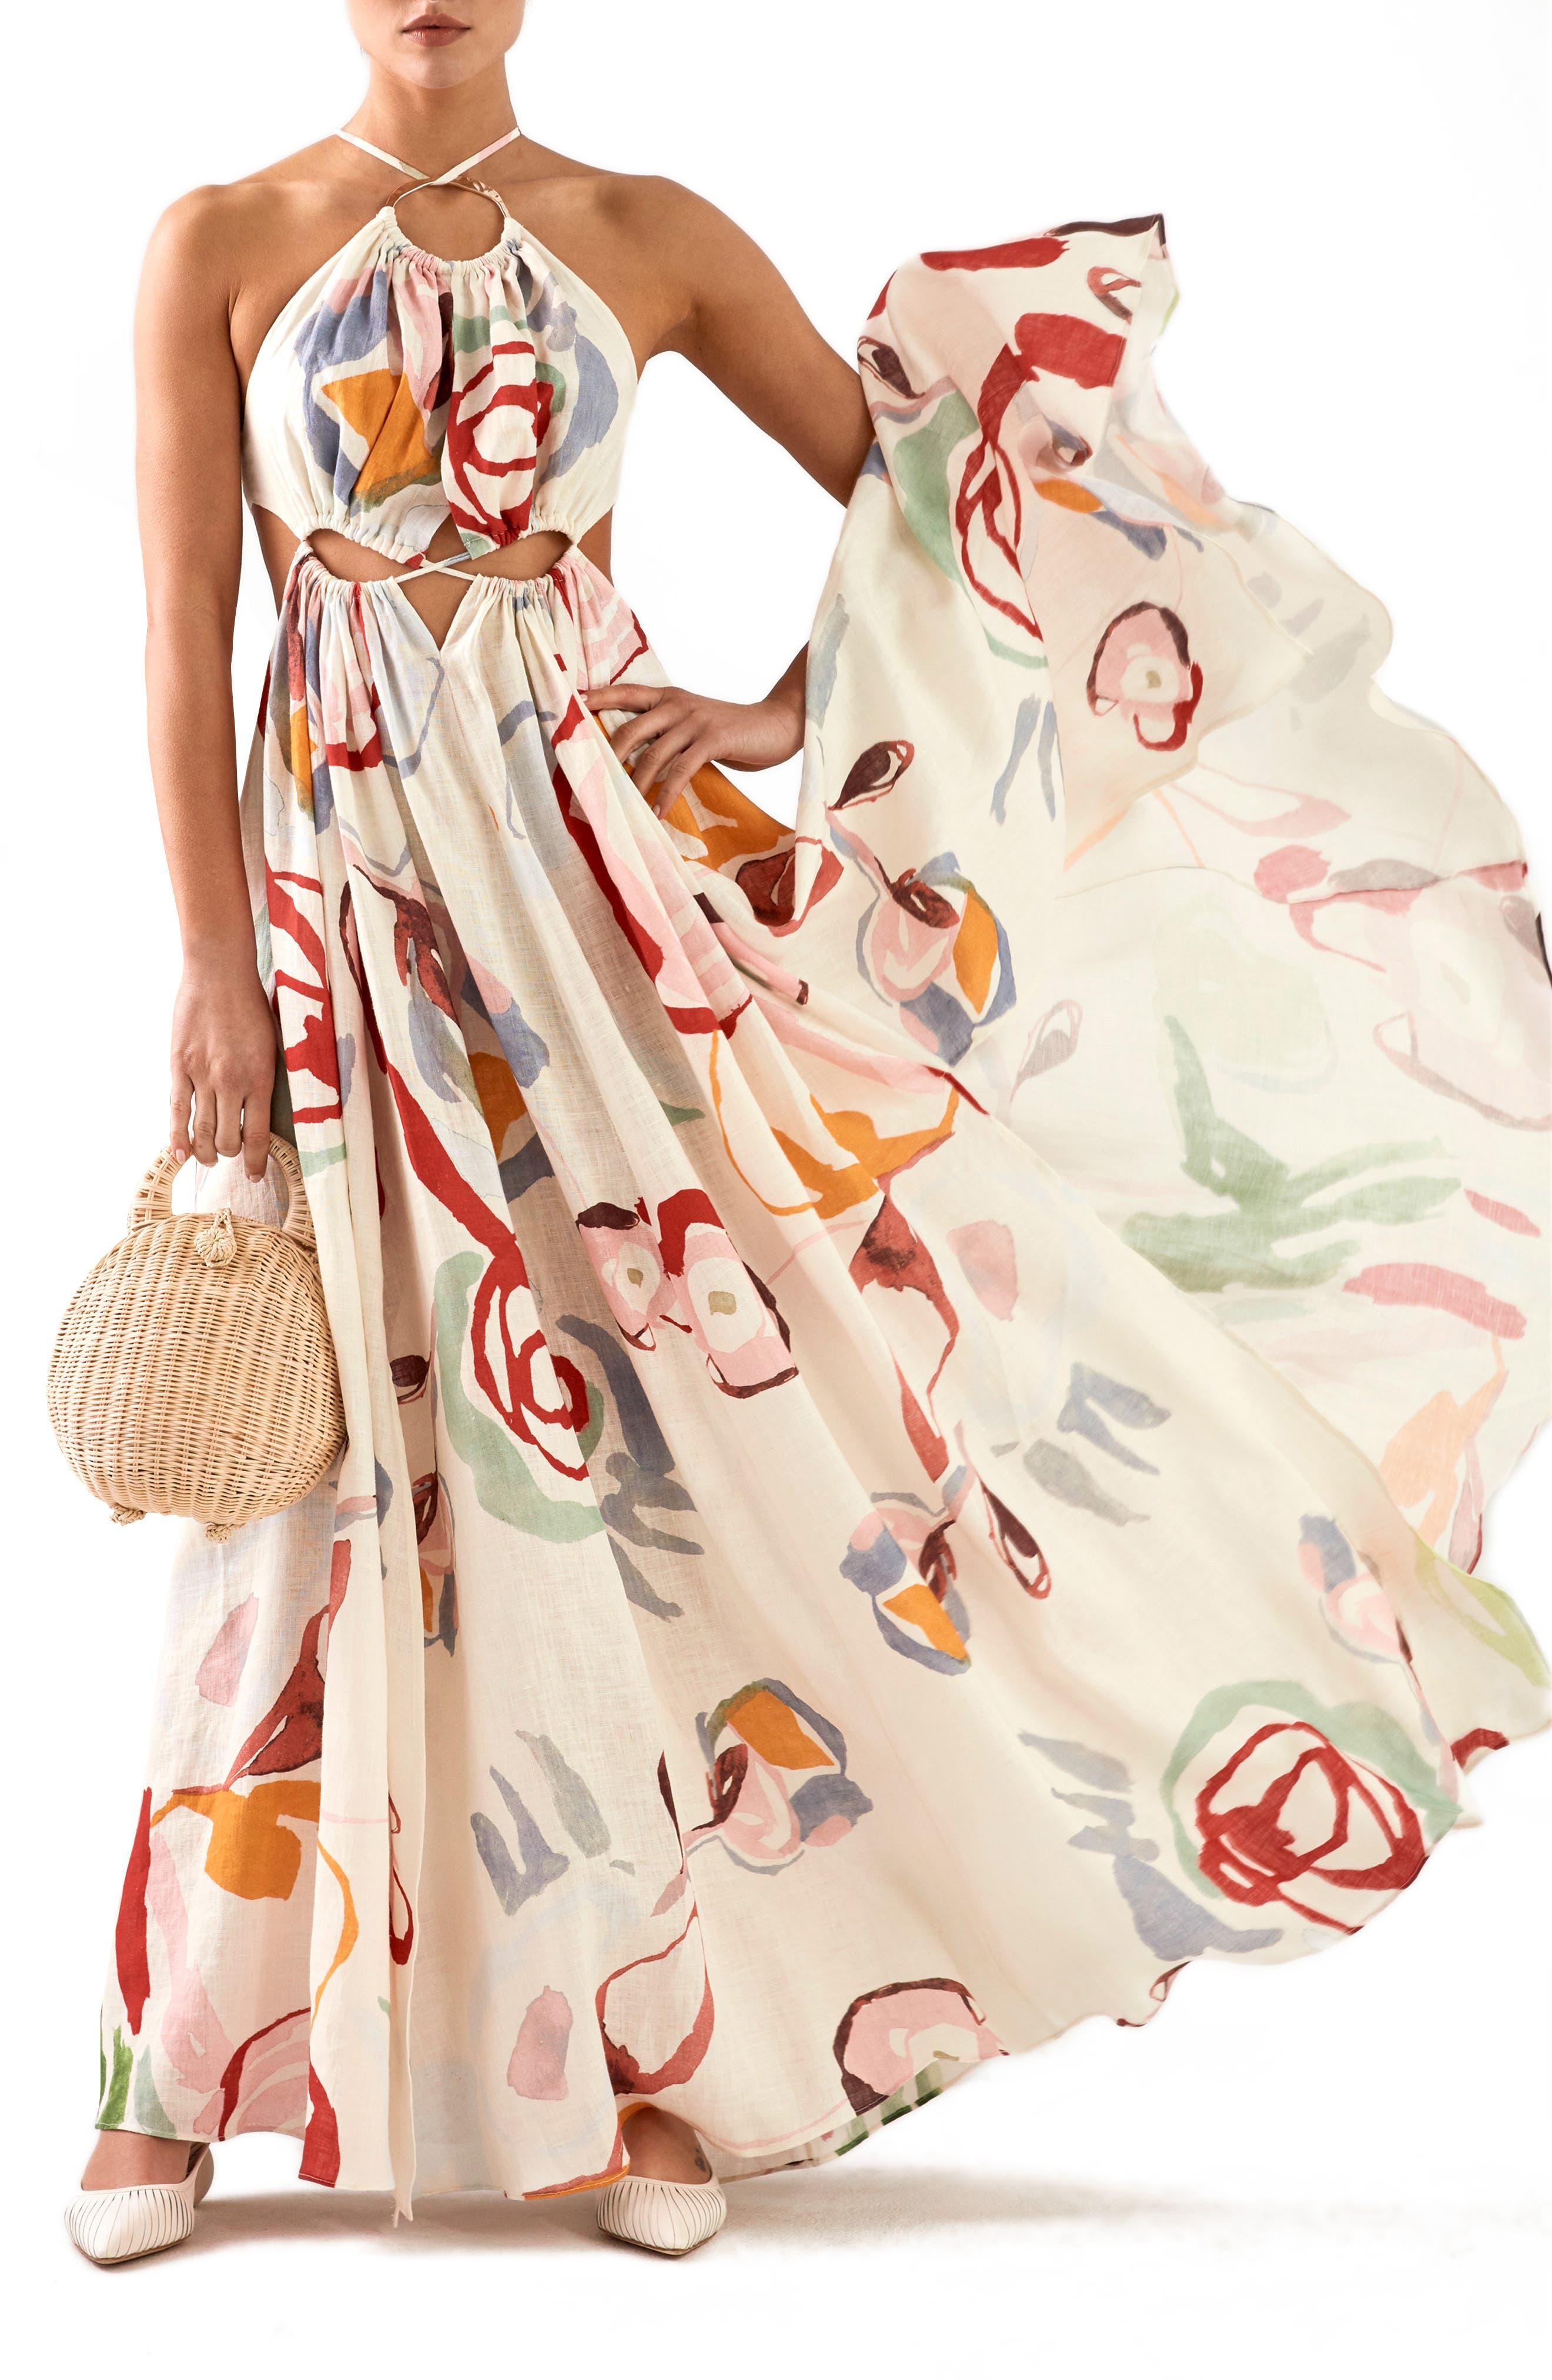 CULT GAIA, Aphrodite Grecian Halter Gown, Main thumbnail 1, color, 100